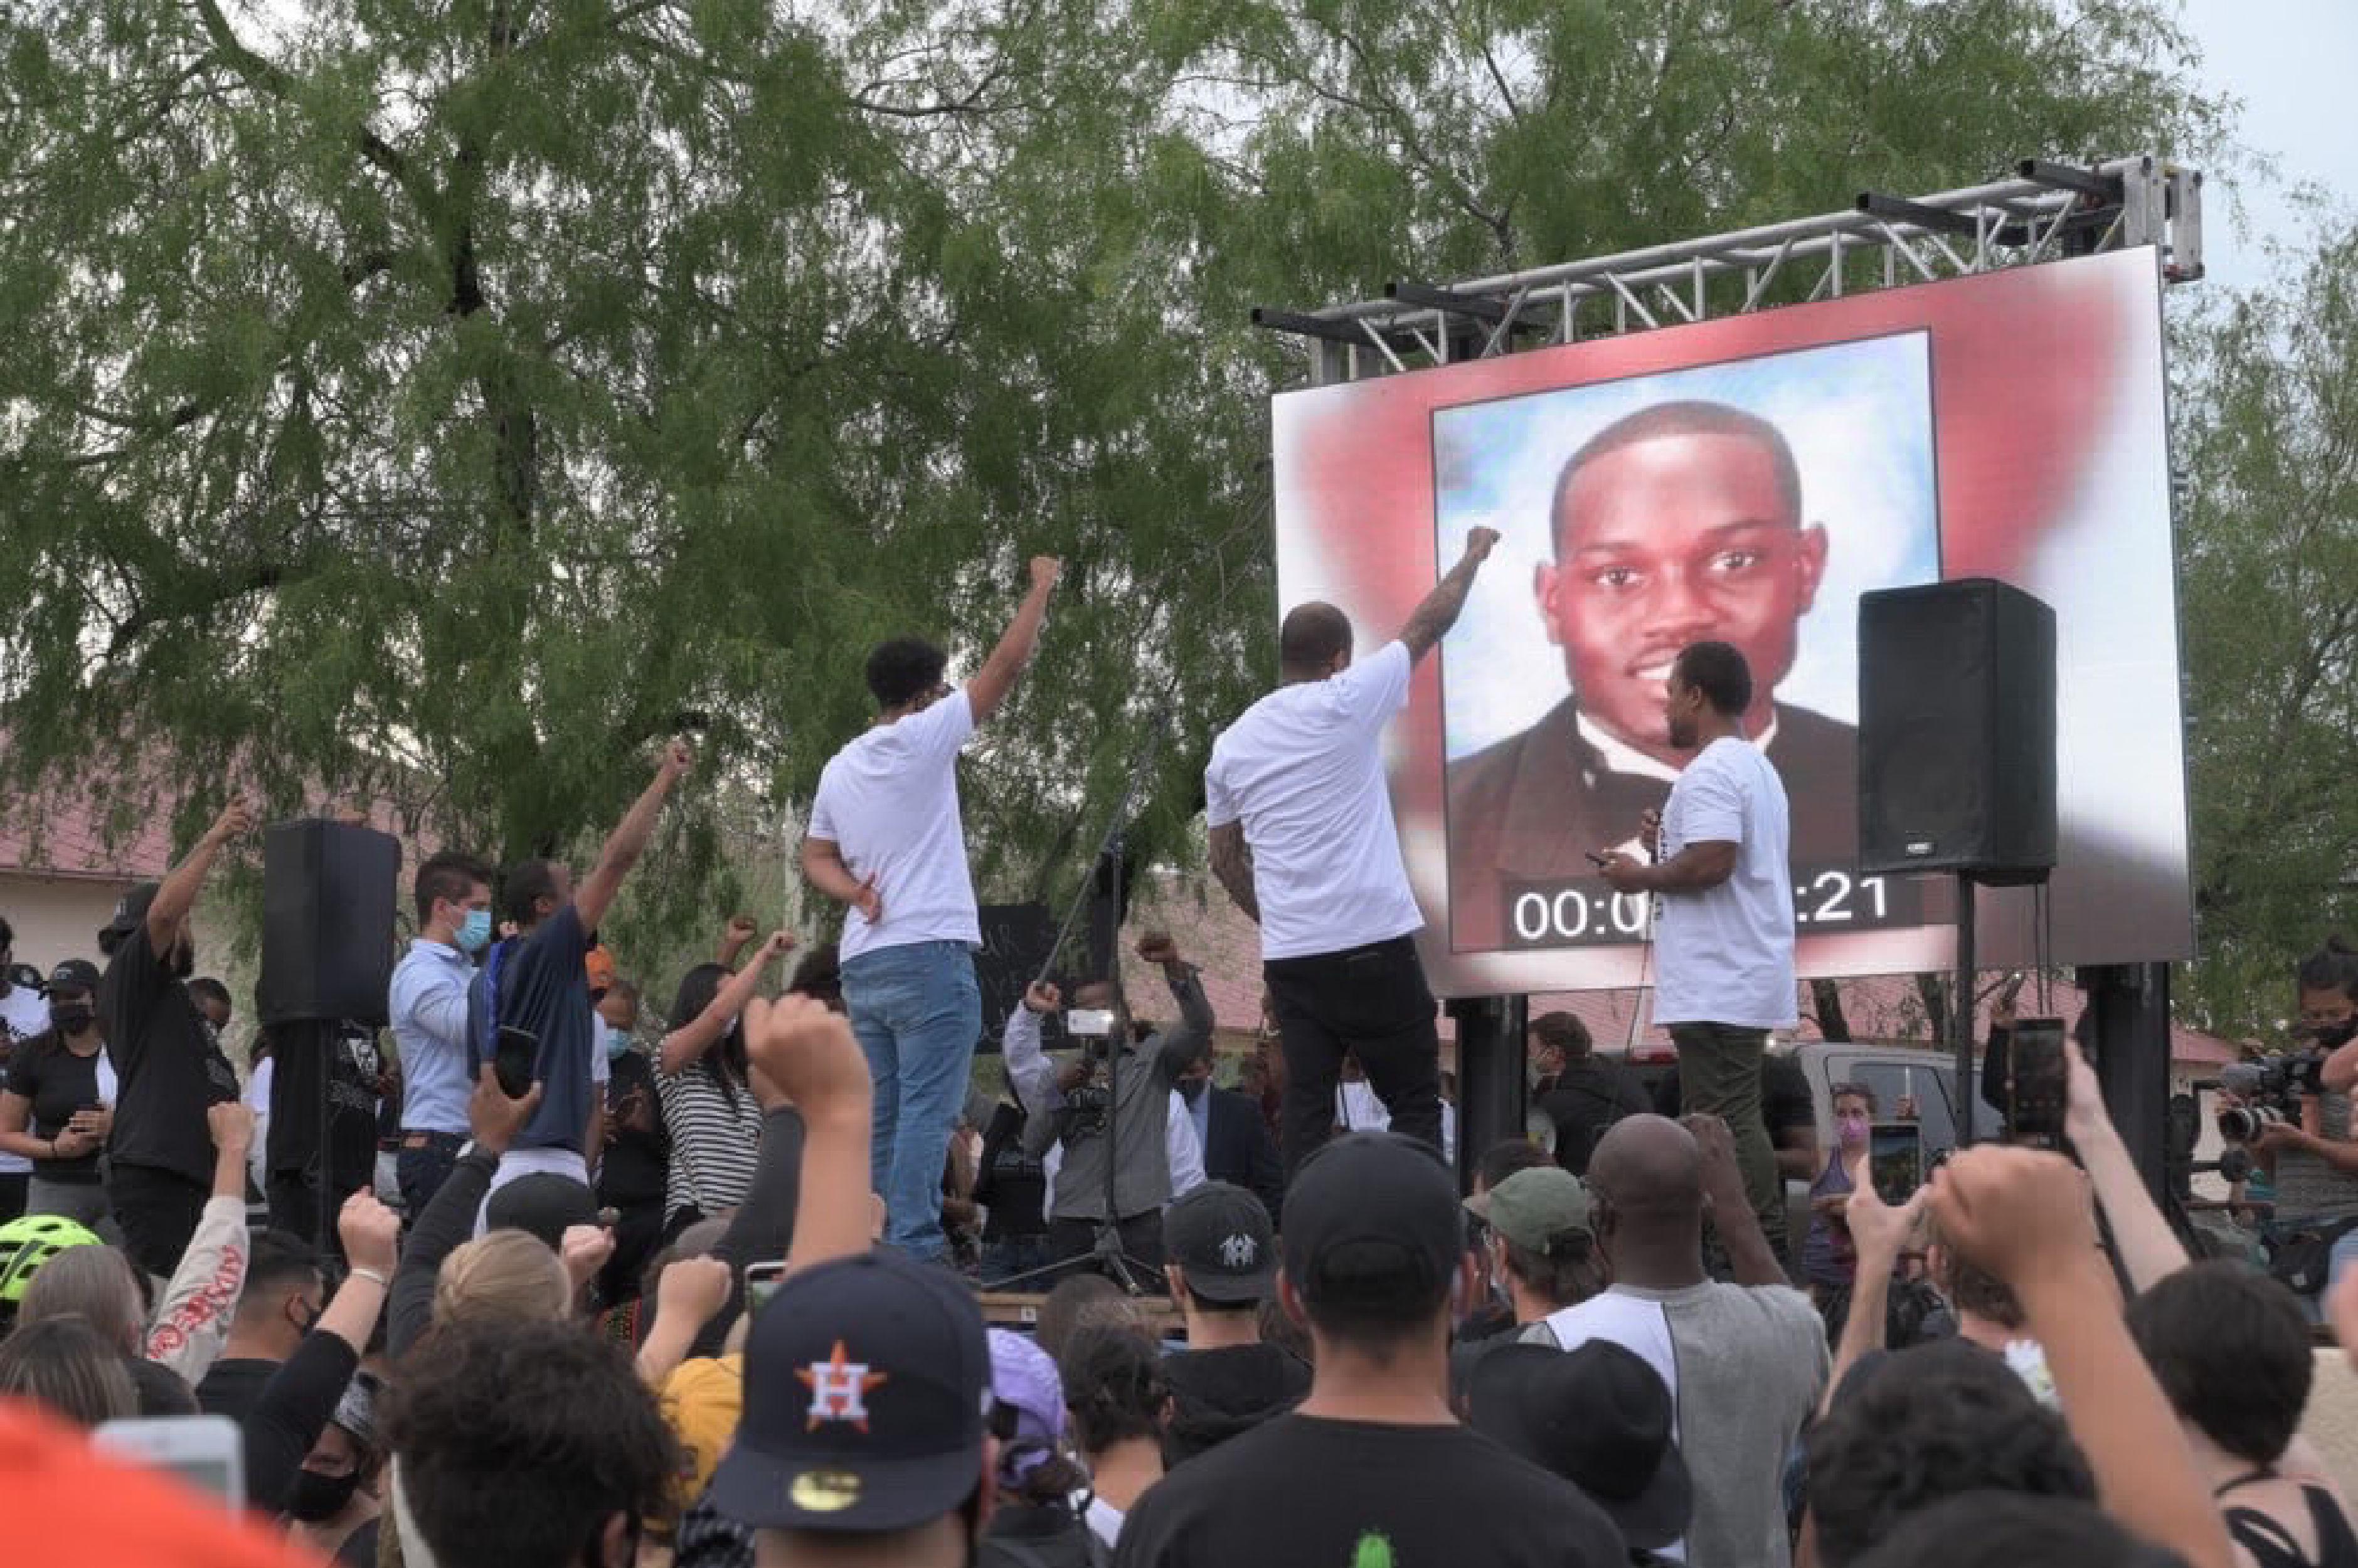 Ahmaud Arbery demonstration